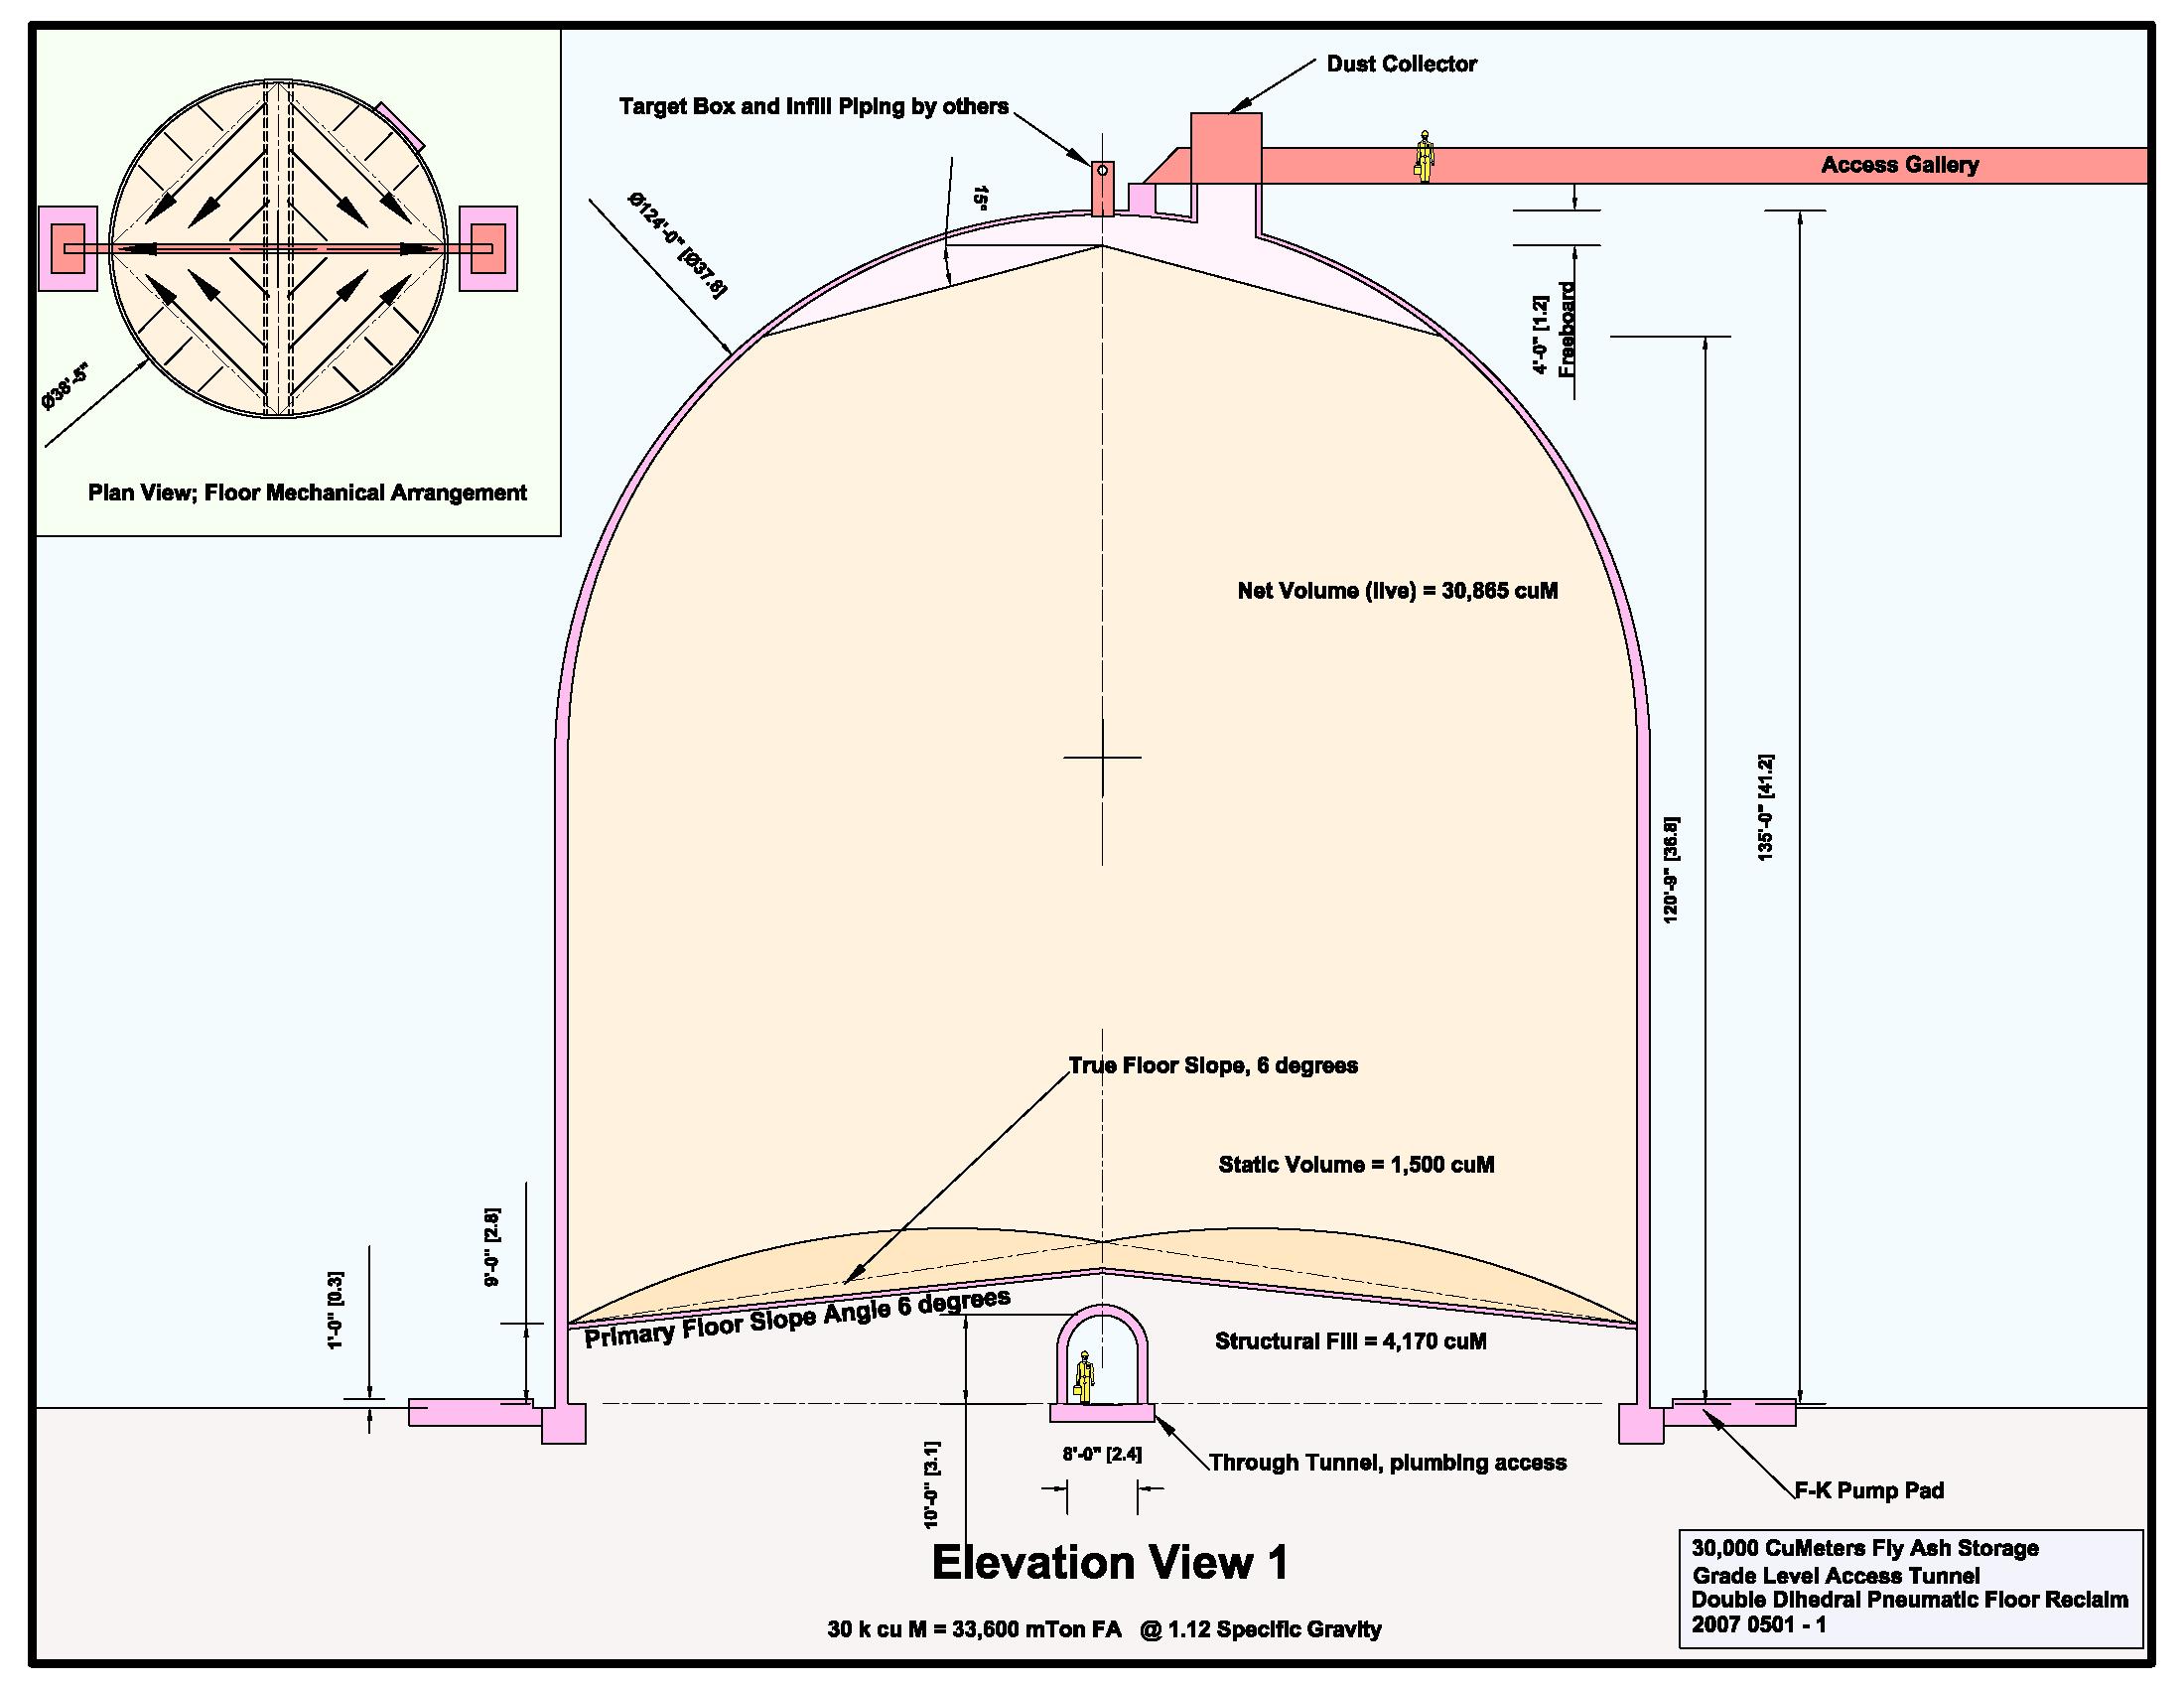 bulk-storage-choices-feature-article-figure 4 - 30k live cuM FA Storage Dome